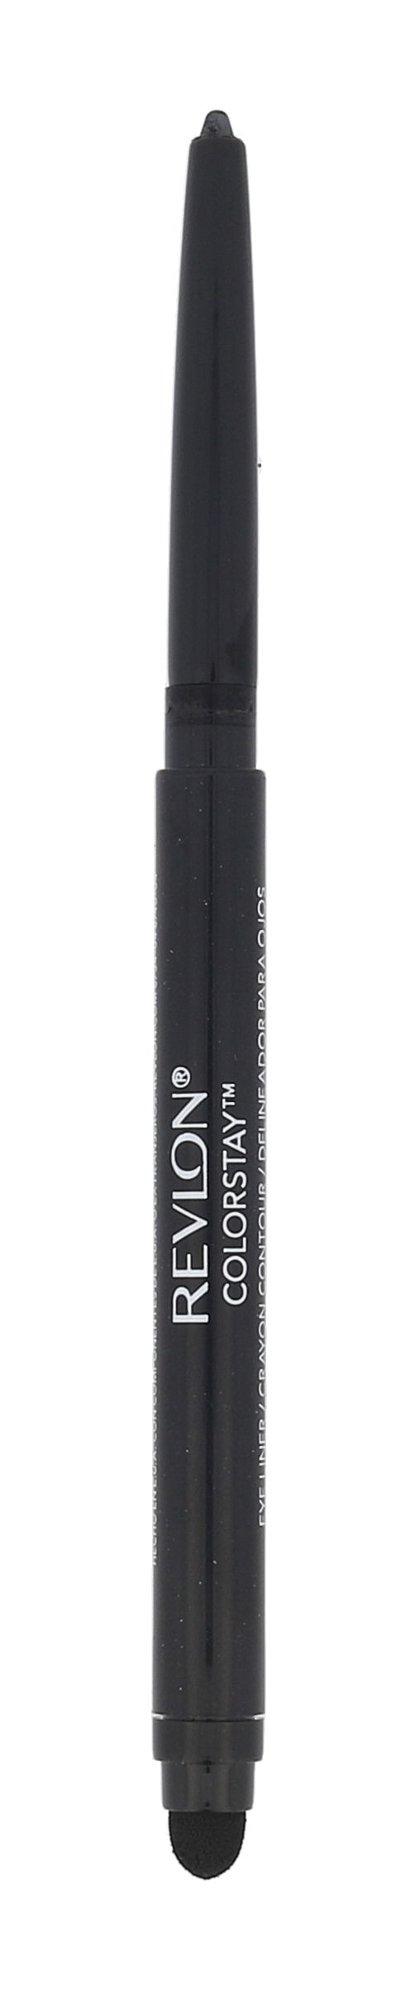 Revlon Colorstay Cosmetic 0,28ml Charcoal